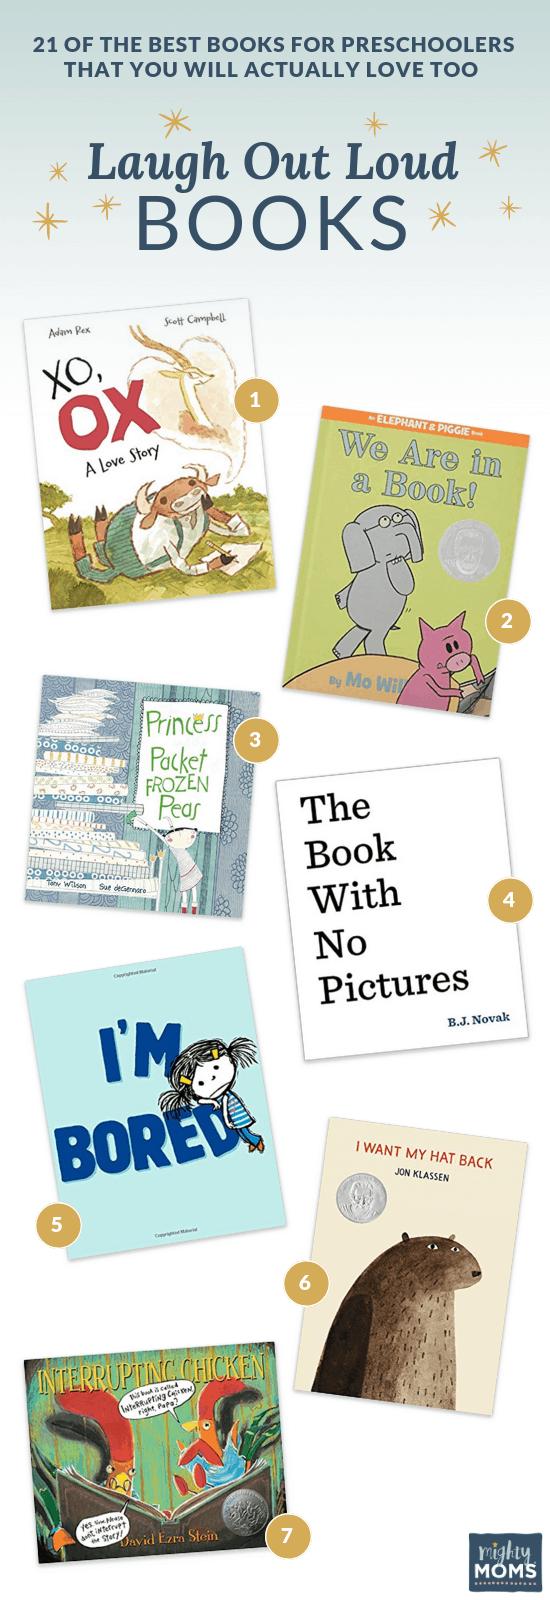 Best Preschool Books for Chuckles - MightyMoms.club